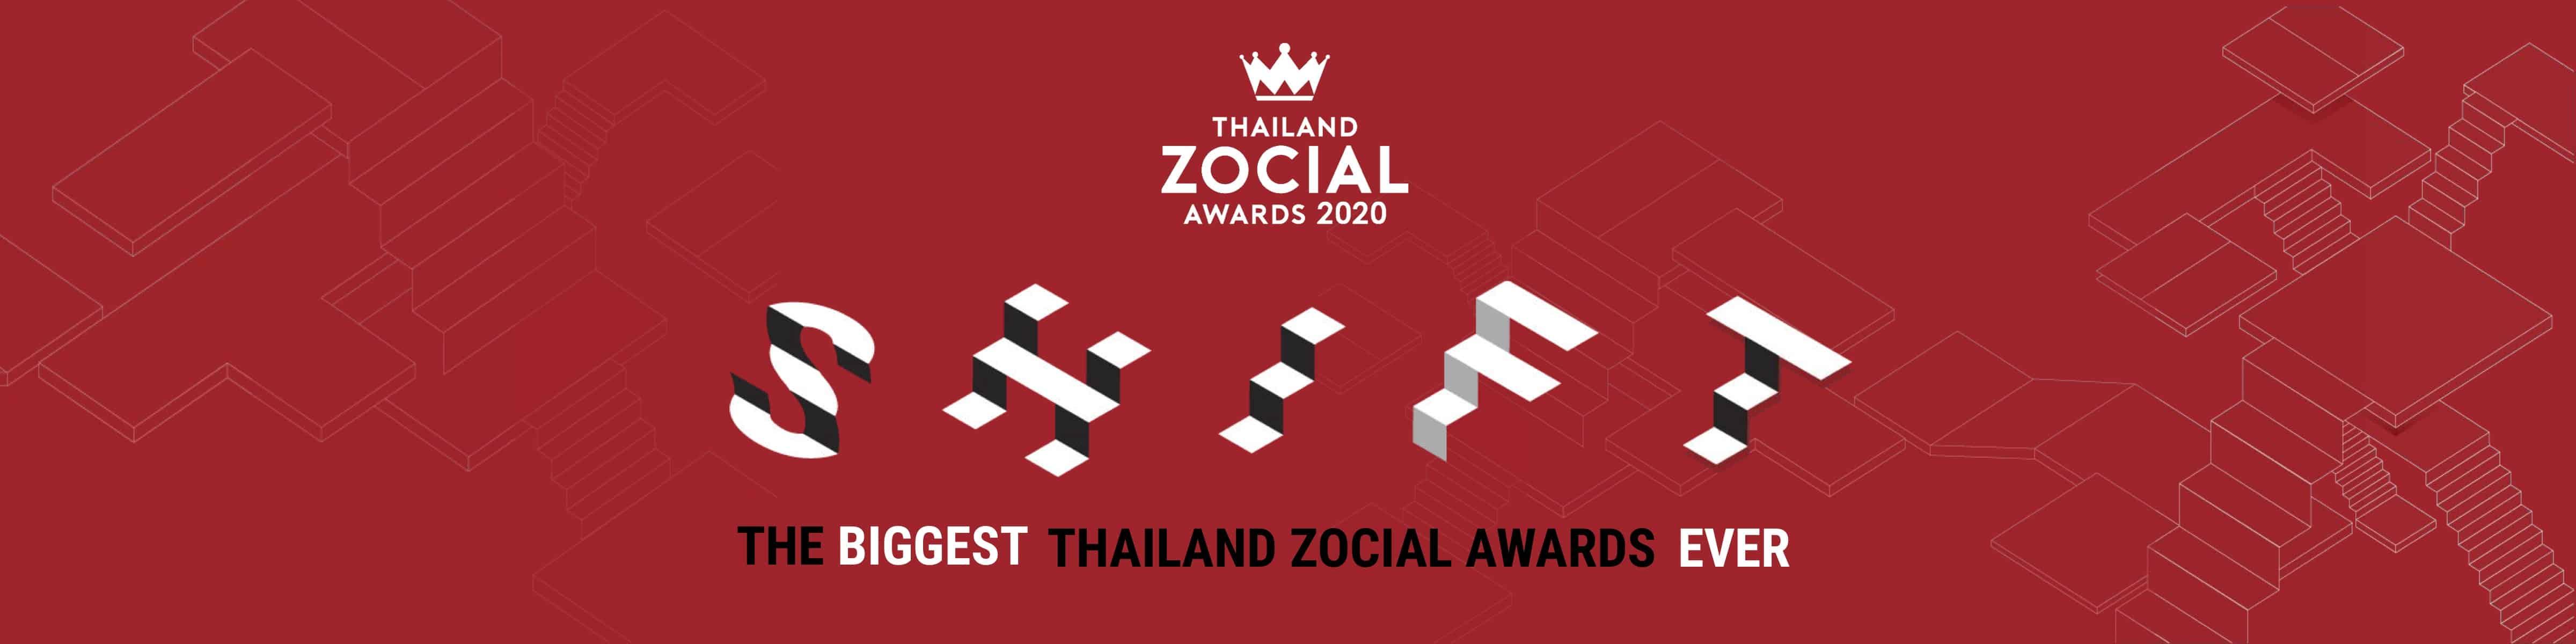 Wisesight จัดใหญ่ Thailand Zocial Awards 2020 ใช้ Social Data เพื่อยกระดับวงการโซเชียล